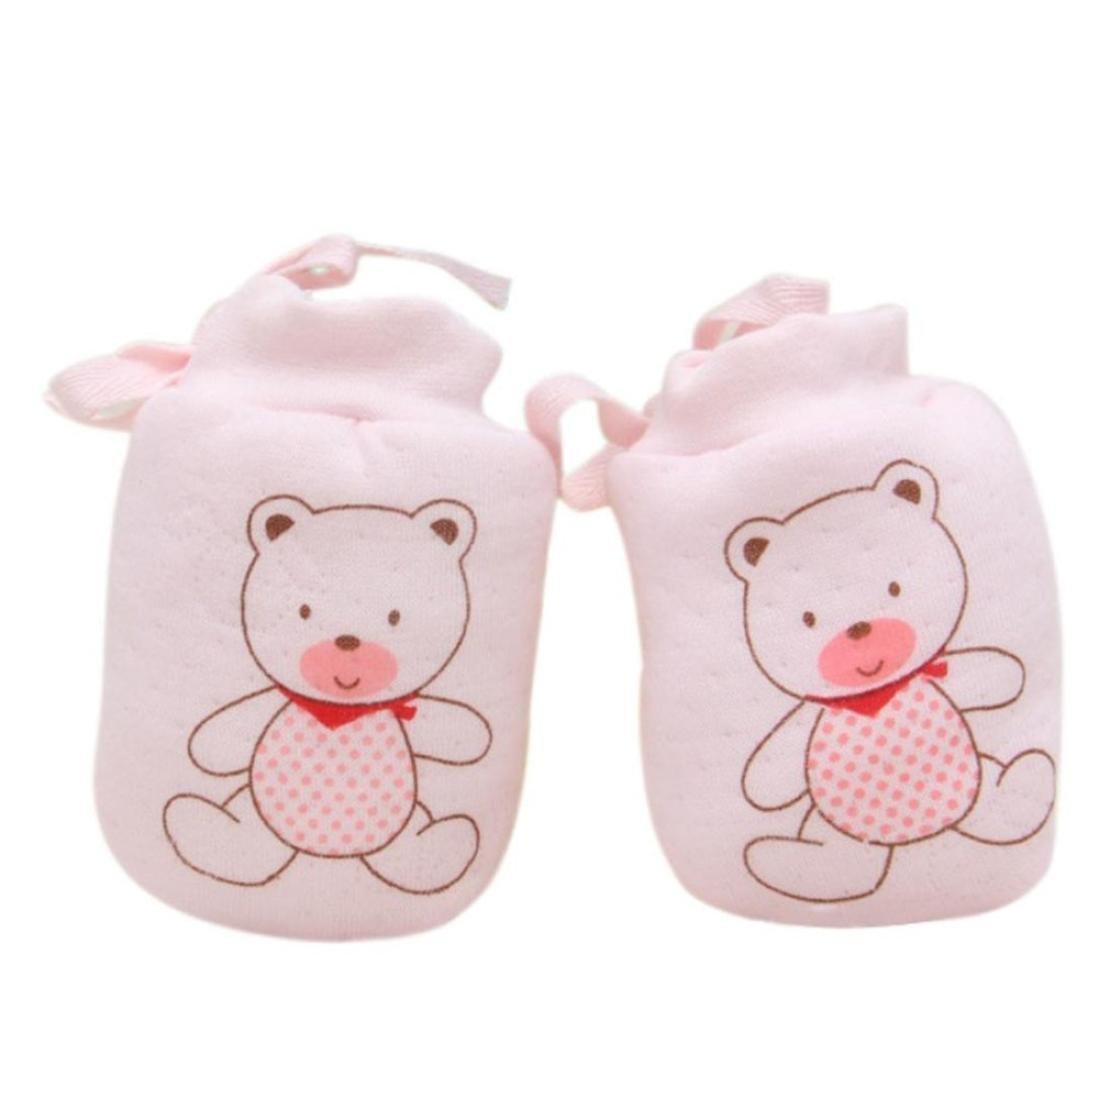 Kolylong 1 Pairs Cartoon Baby Anti Scratch Mittens Soft Newborn Rope Thickness Gloves Gift Kolylong-JI5